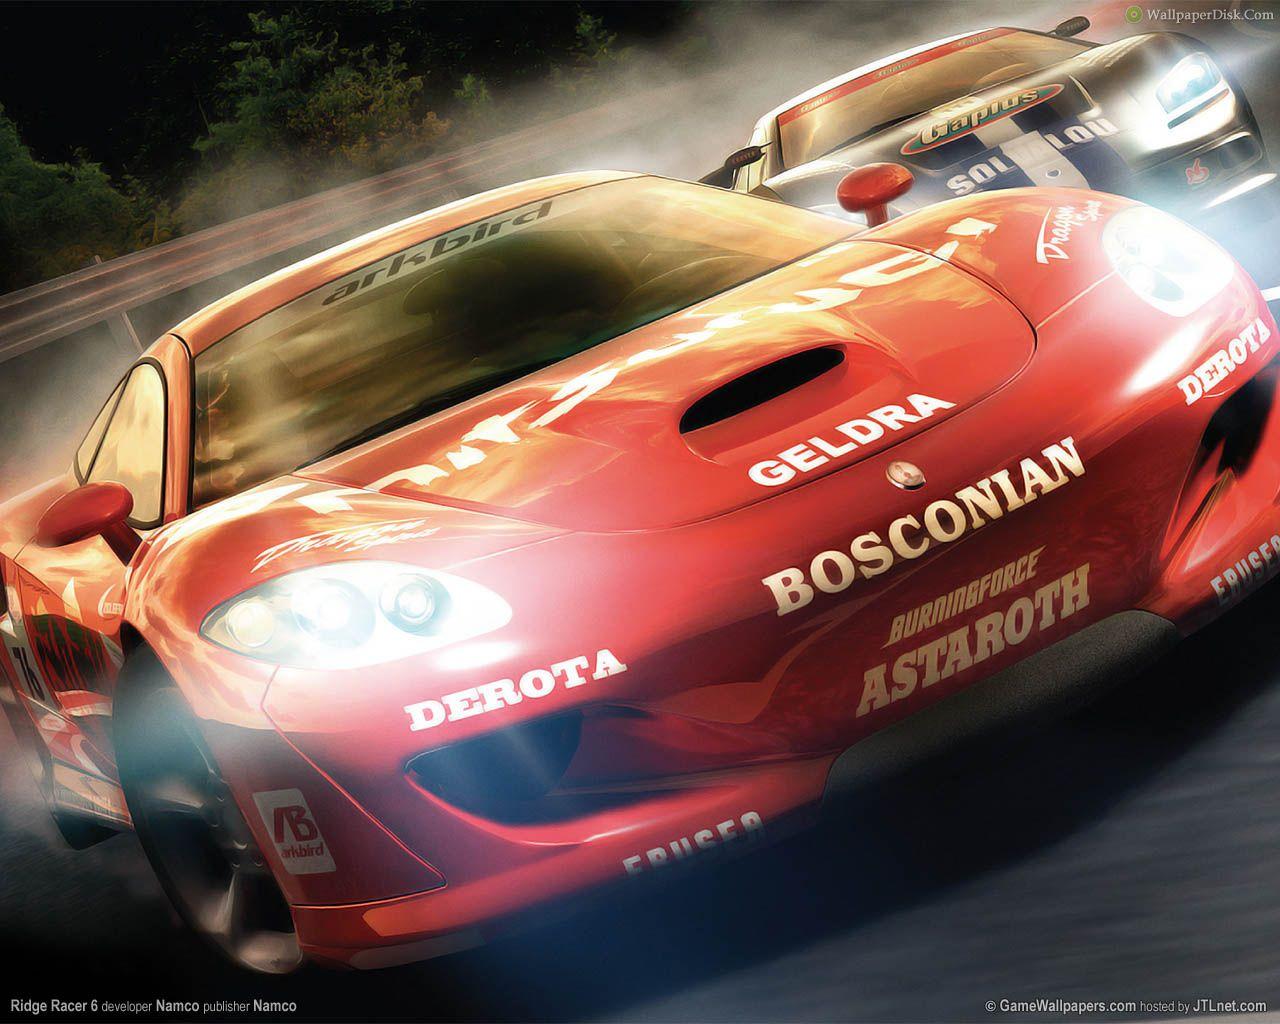 Free Ridge Racer 7 Wallpaper In 1280x800: Free Wallpaper For Xbox 360